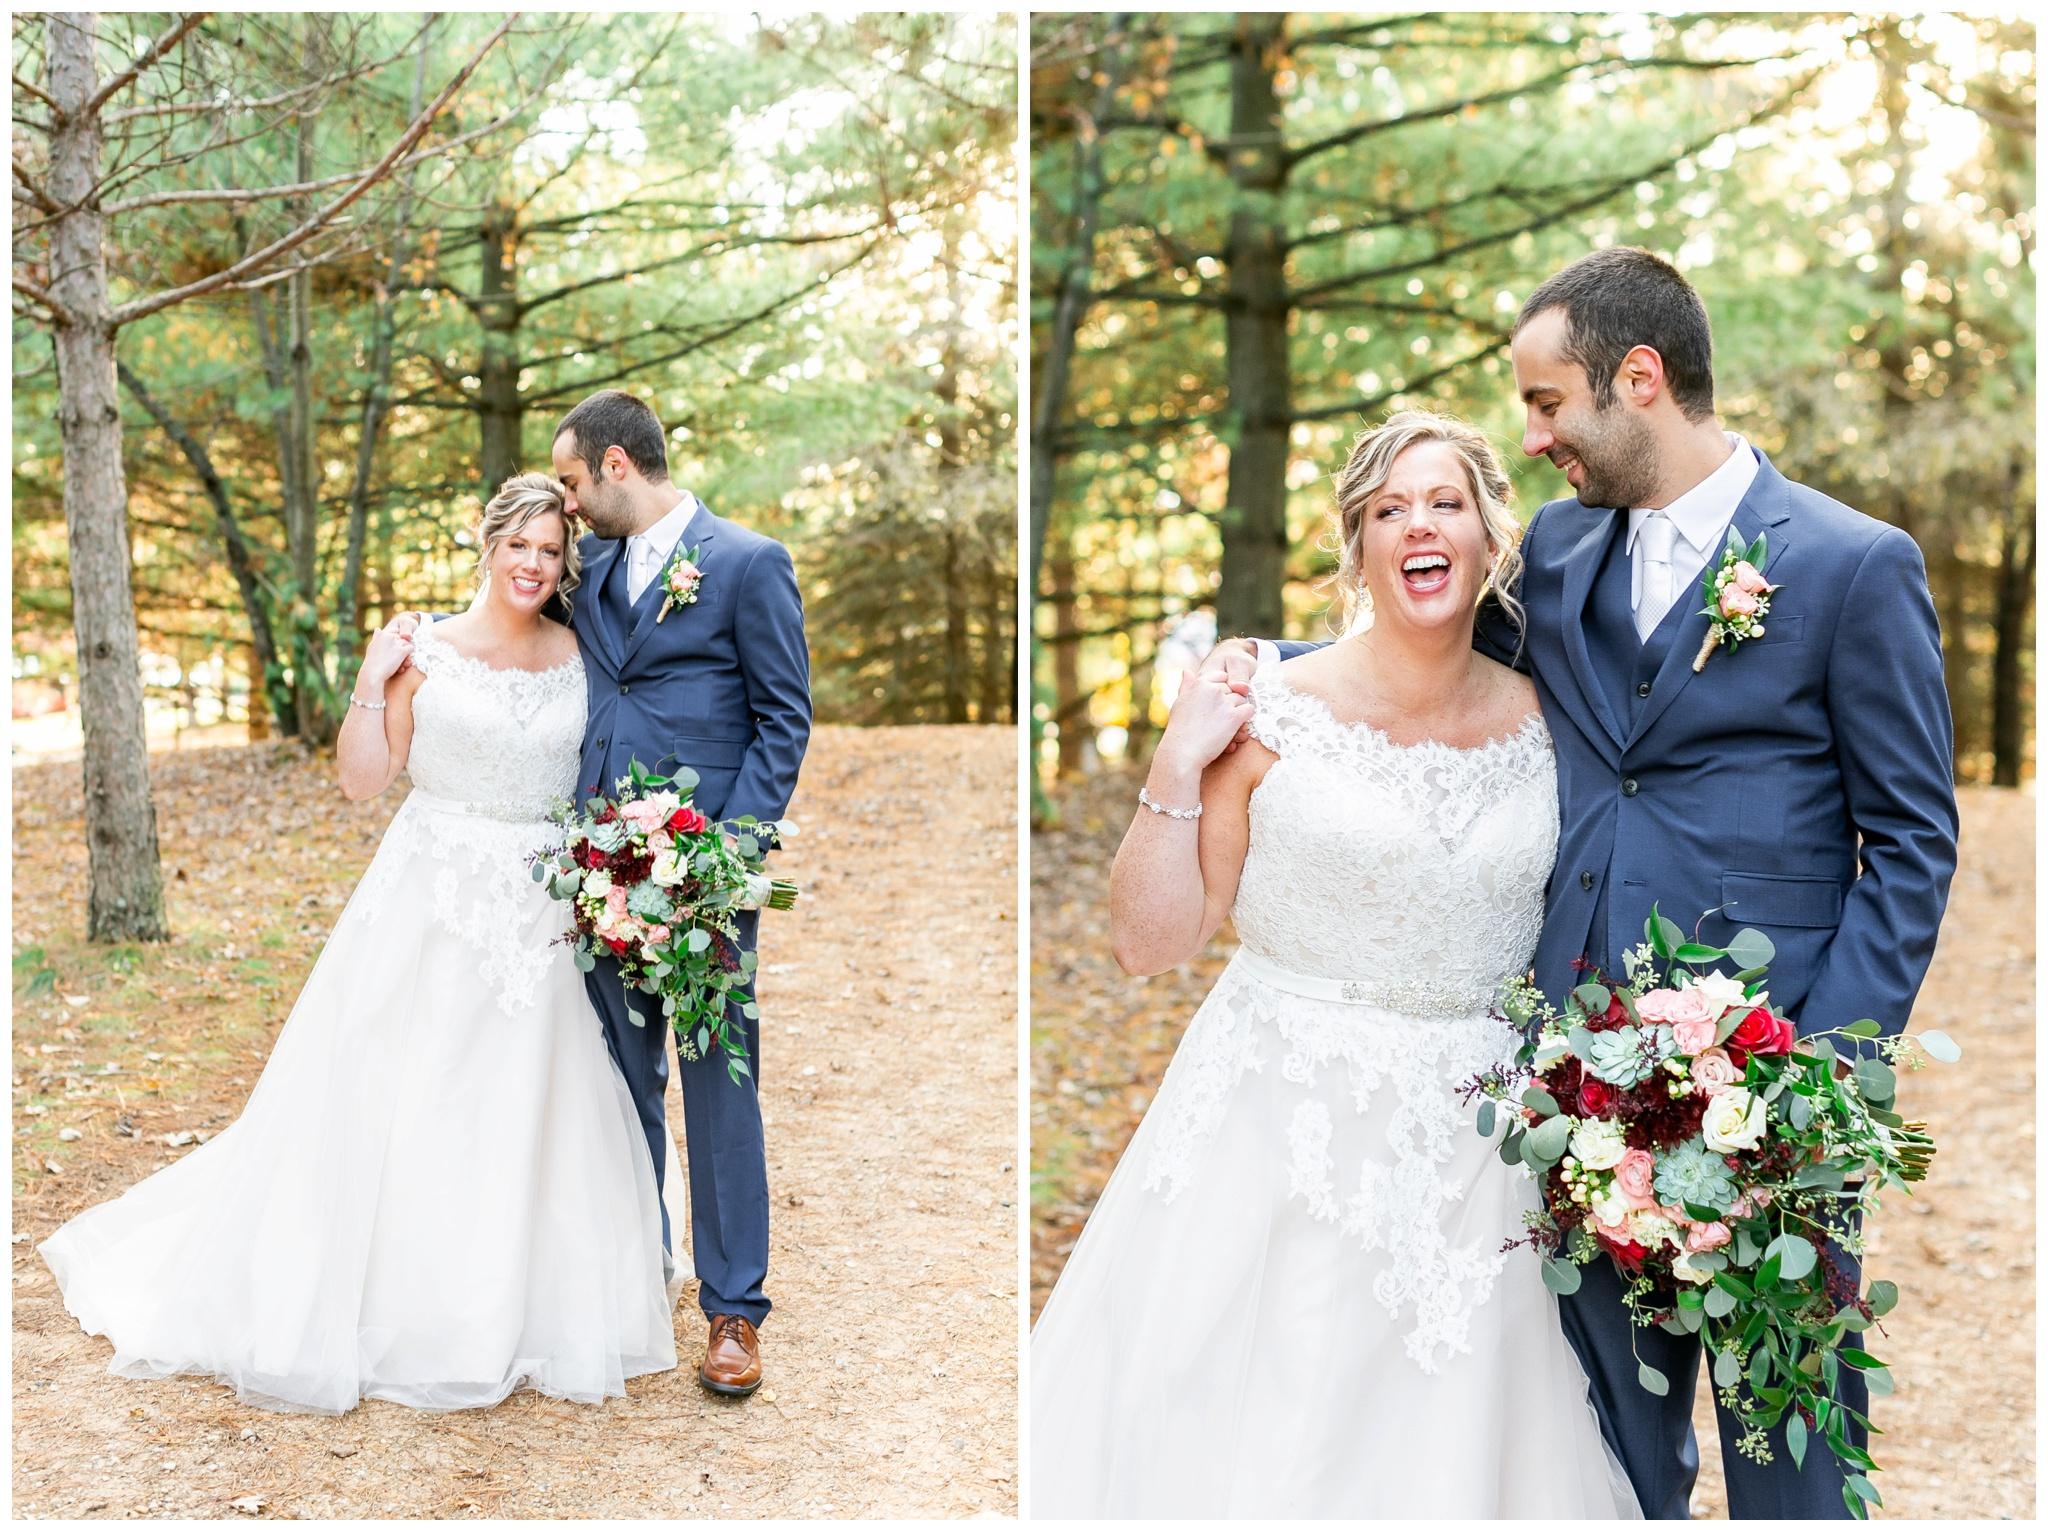 Shawano_County_park_Wedding_Caynay_Photo_Madison_Wi_2321.jpg